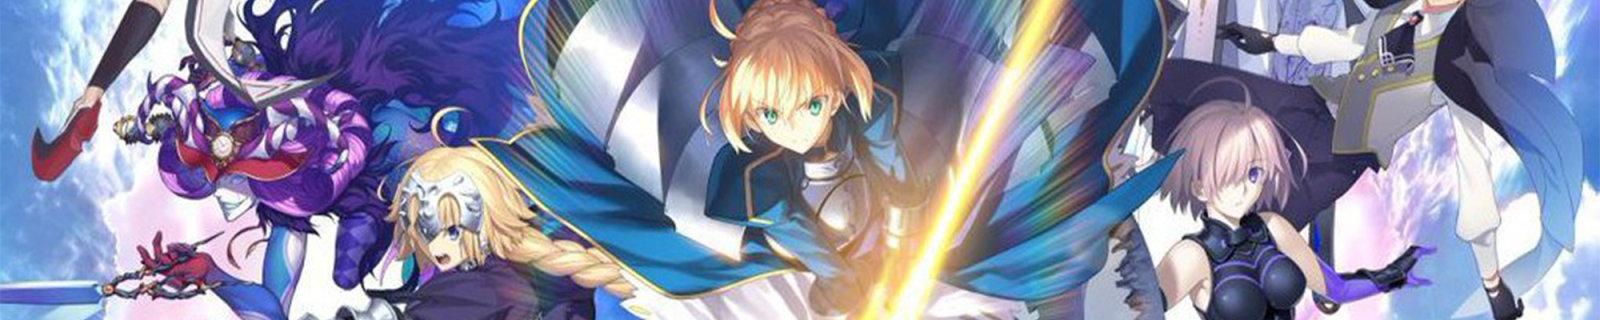 《Fate/EXTELLA》的限定特典到底有哪些?